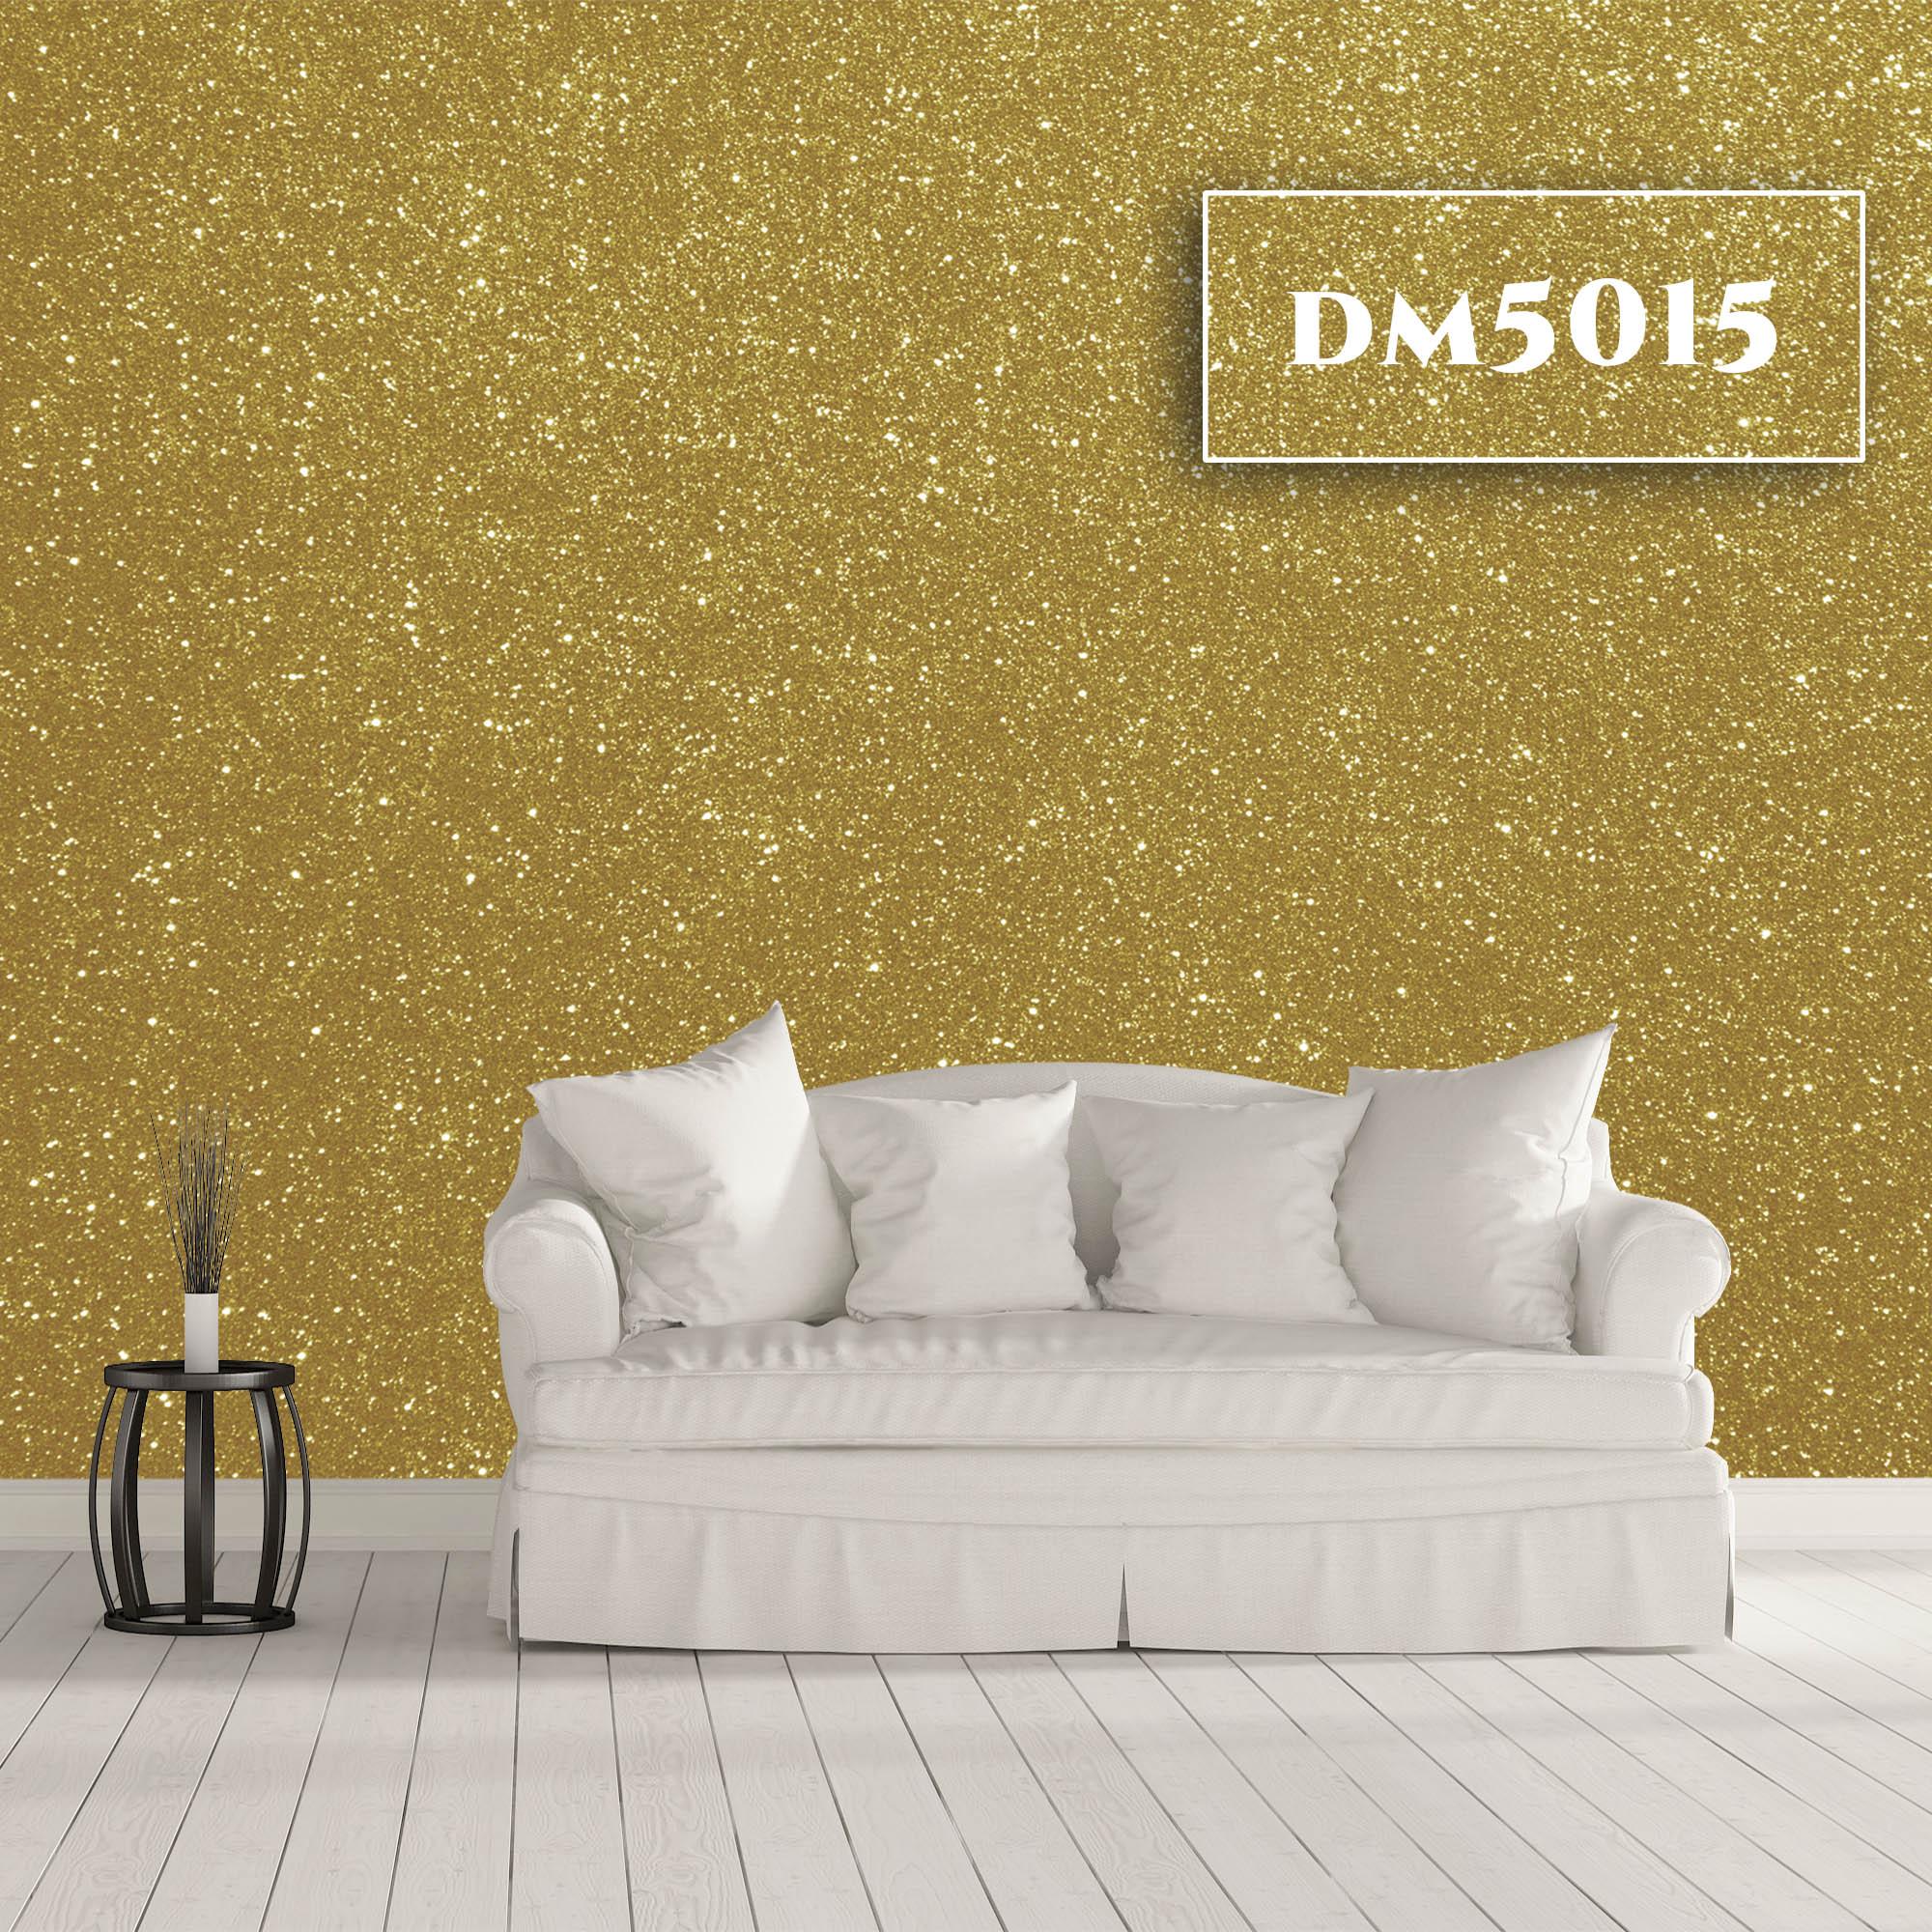 DM5015